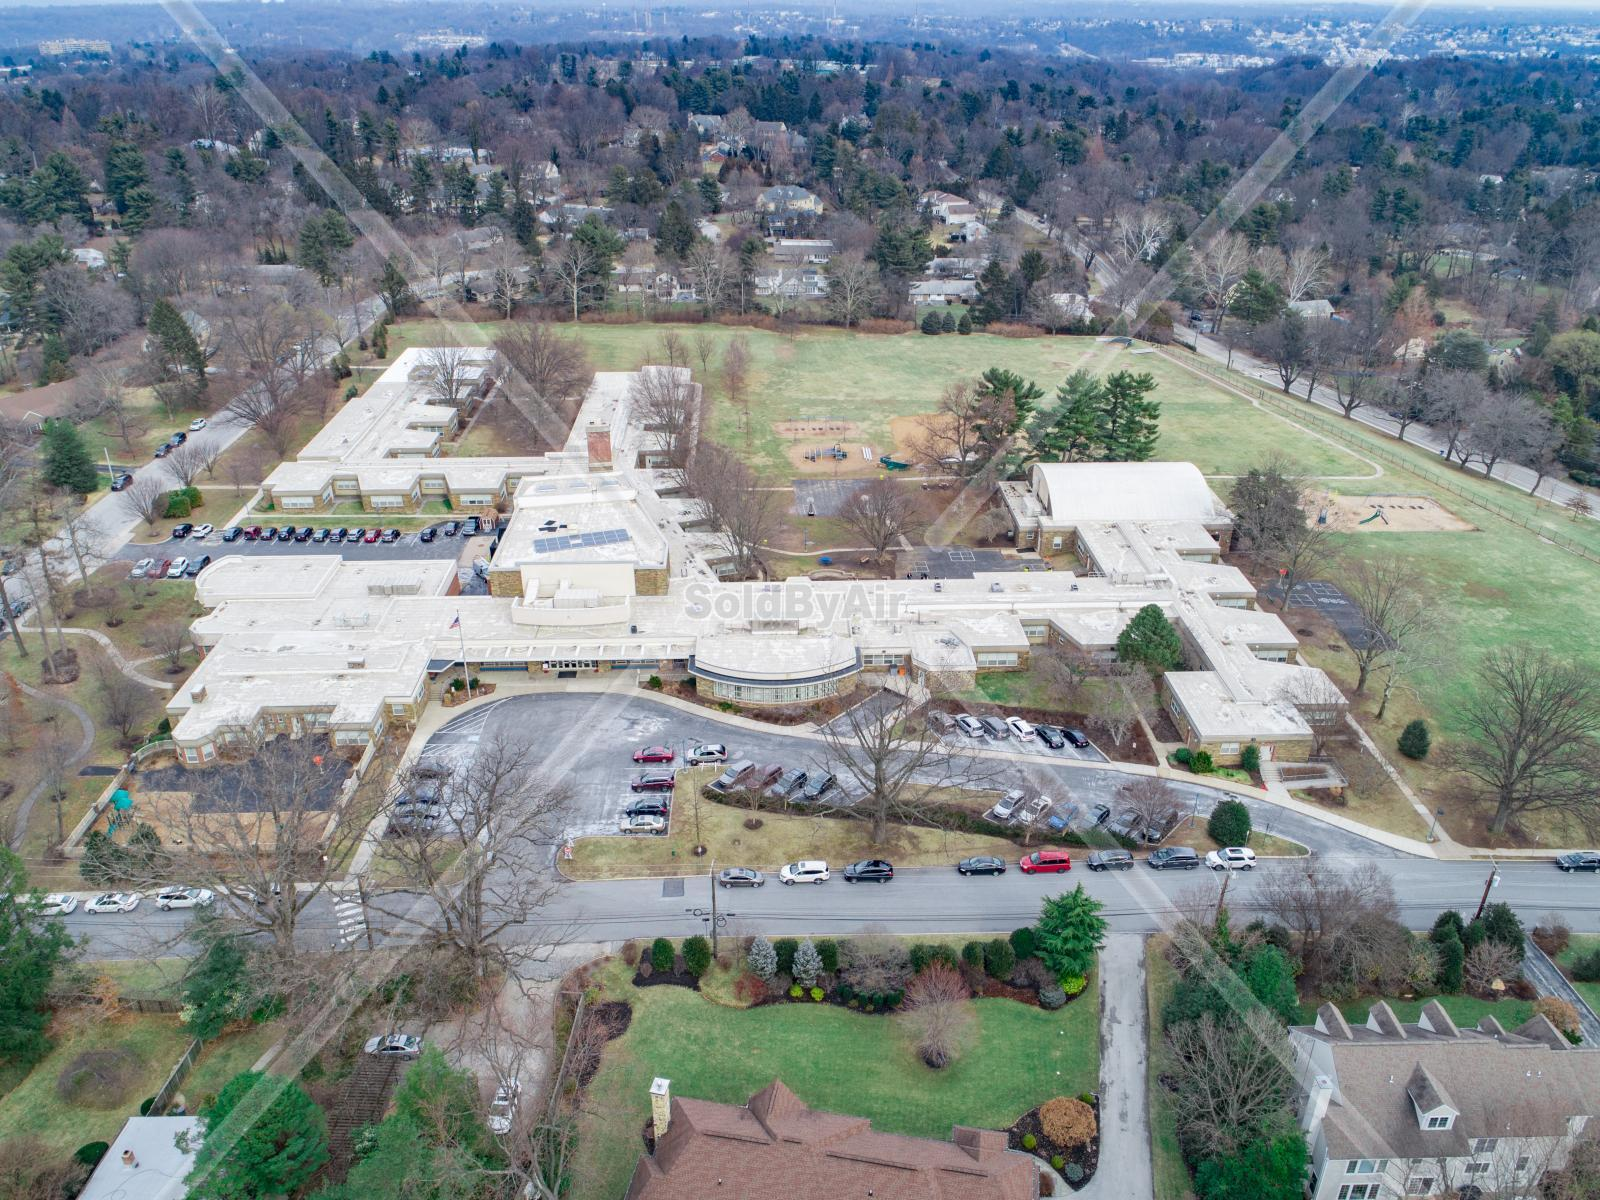 Drone Photo of Penn Valley Elementary School in Wynnewood Pennsylvania